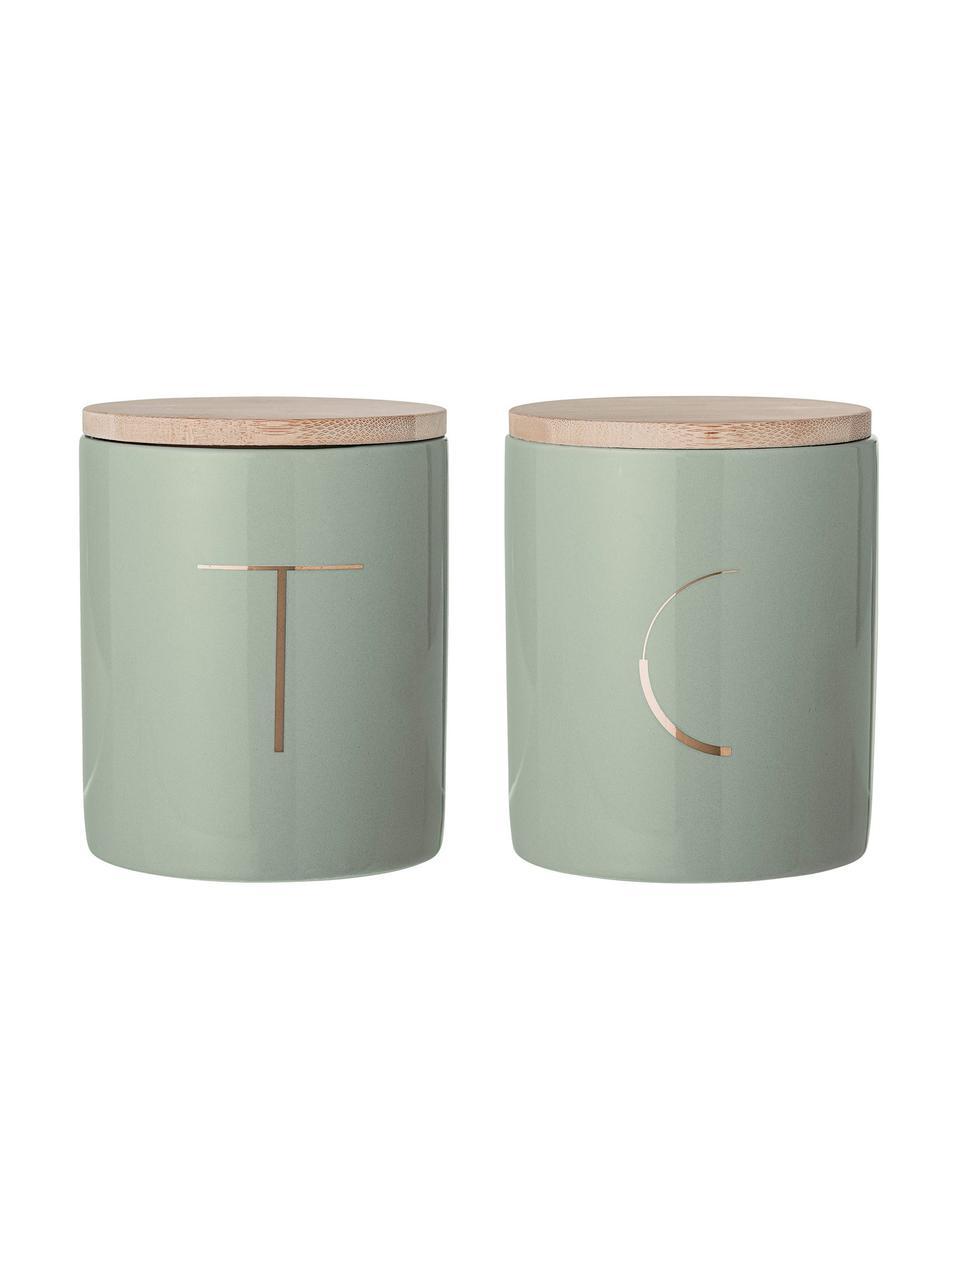 Set scatole verde menta Aileen 2 pz, Contenitore: terracotta, Coperchio: bambù, silicone, Verde menta, legno di bambù, Ø 10 x Alt. 13 cm